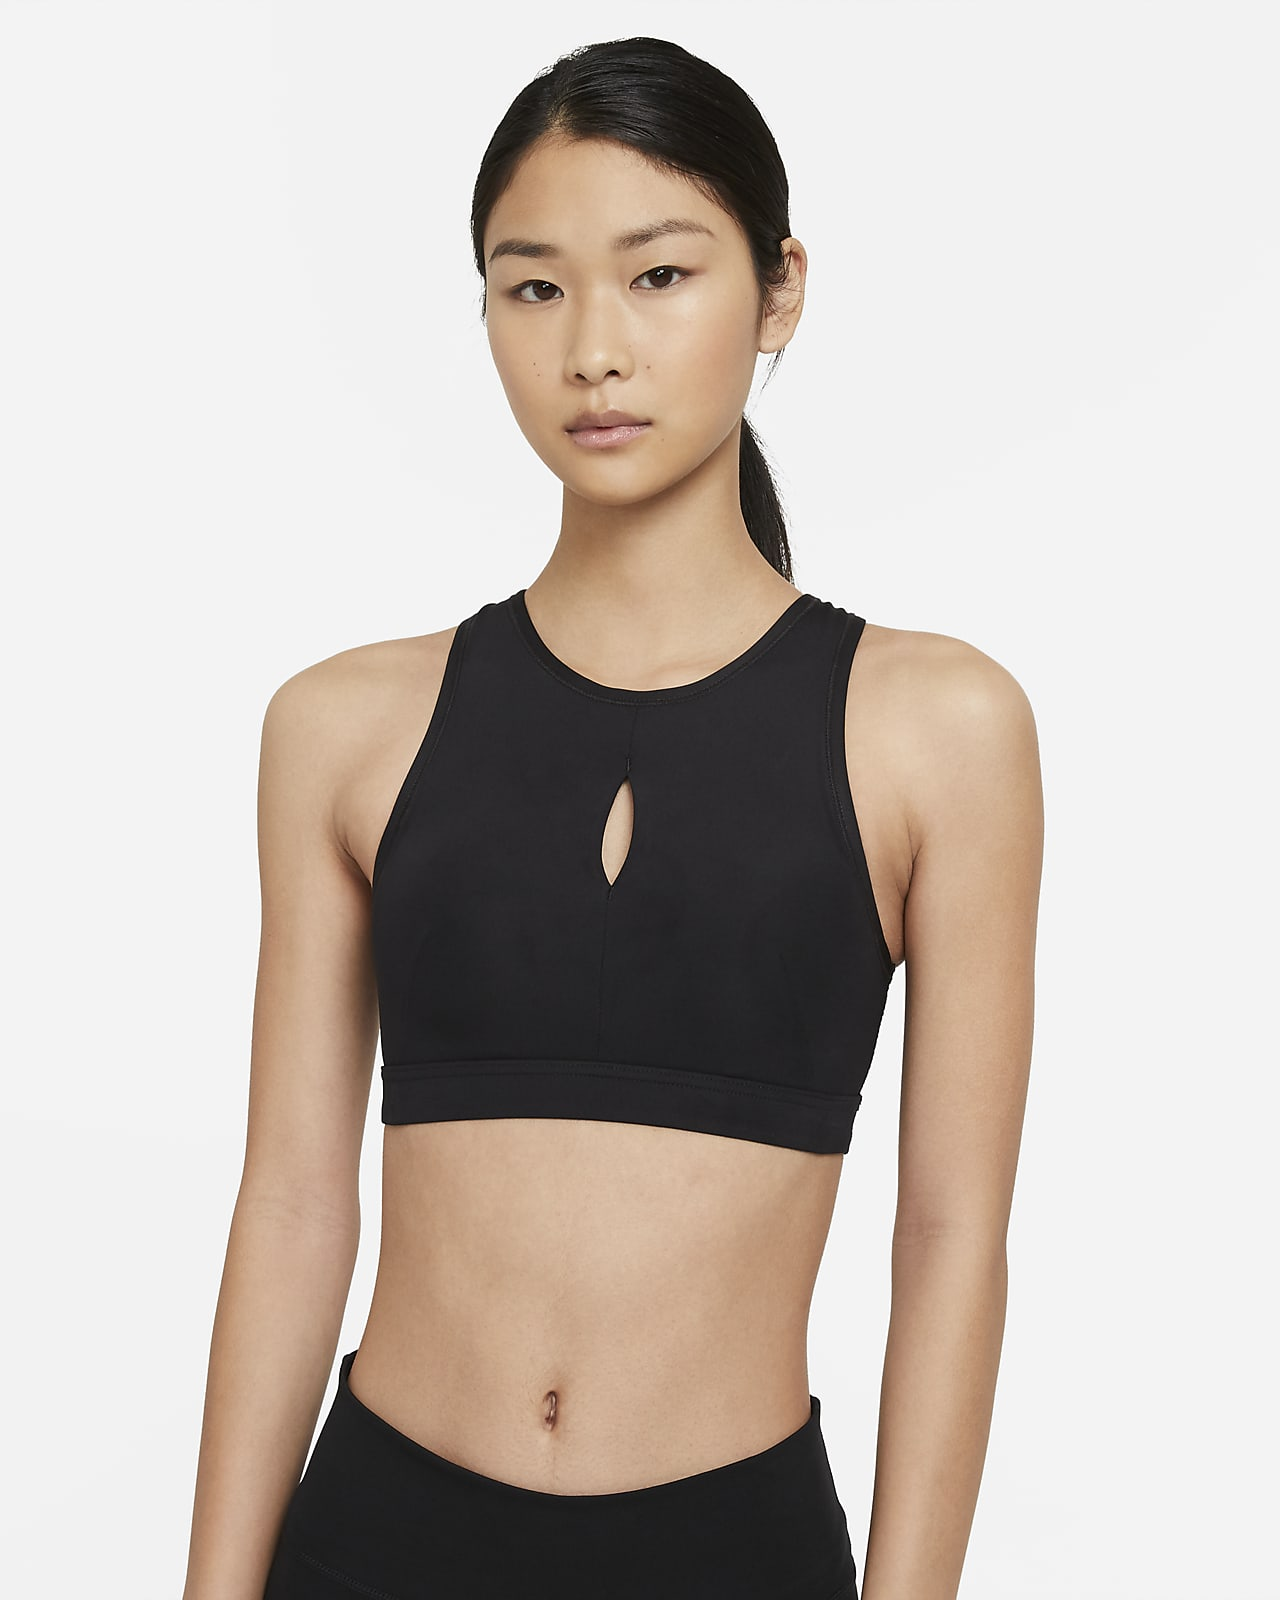 Nike Yoga Swoosh Women's Medium-Support Sports Bra